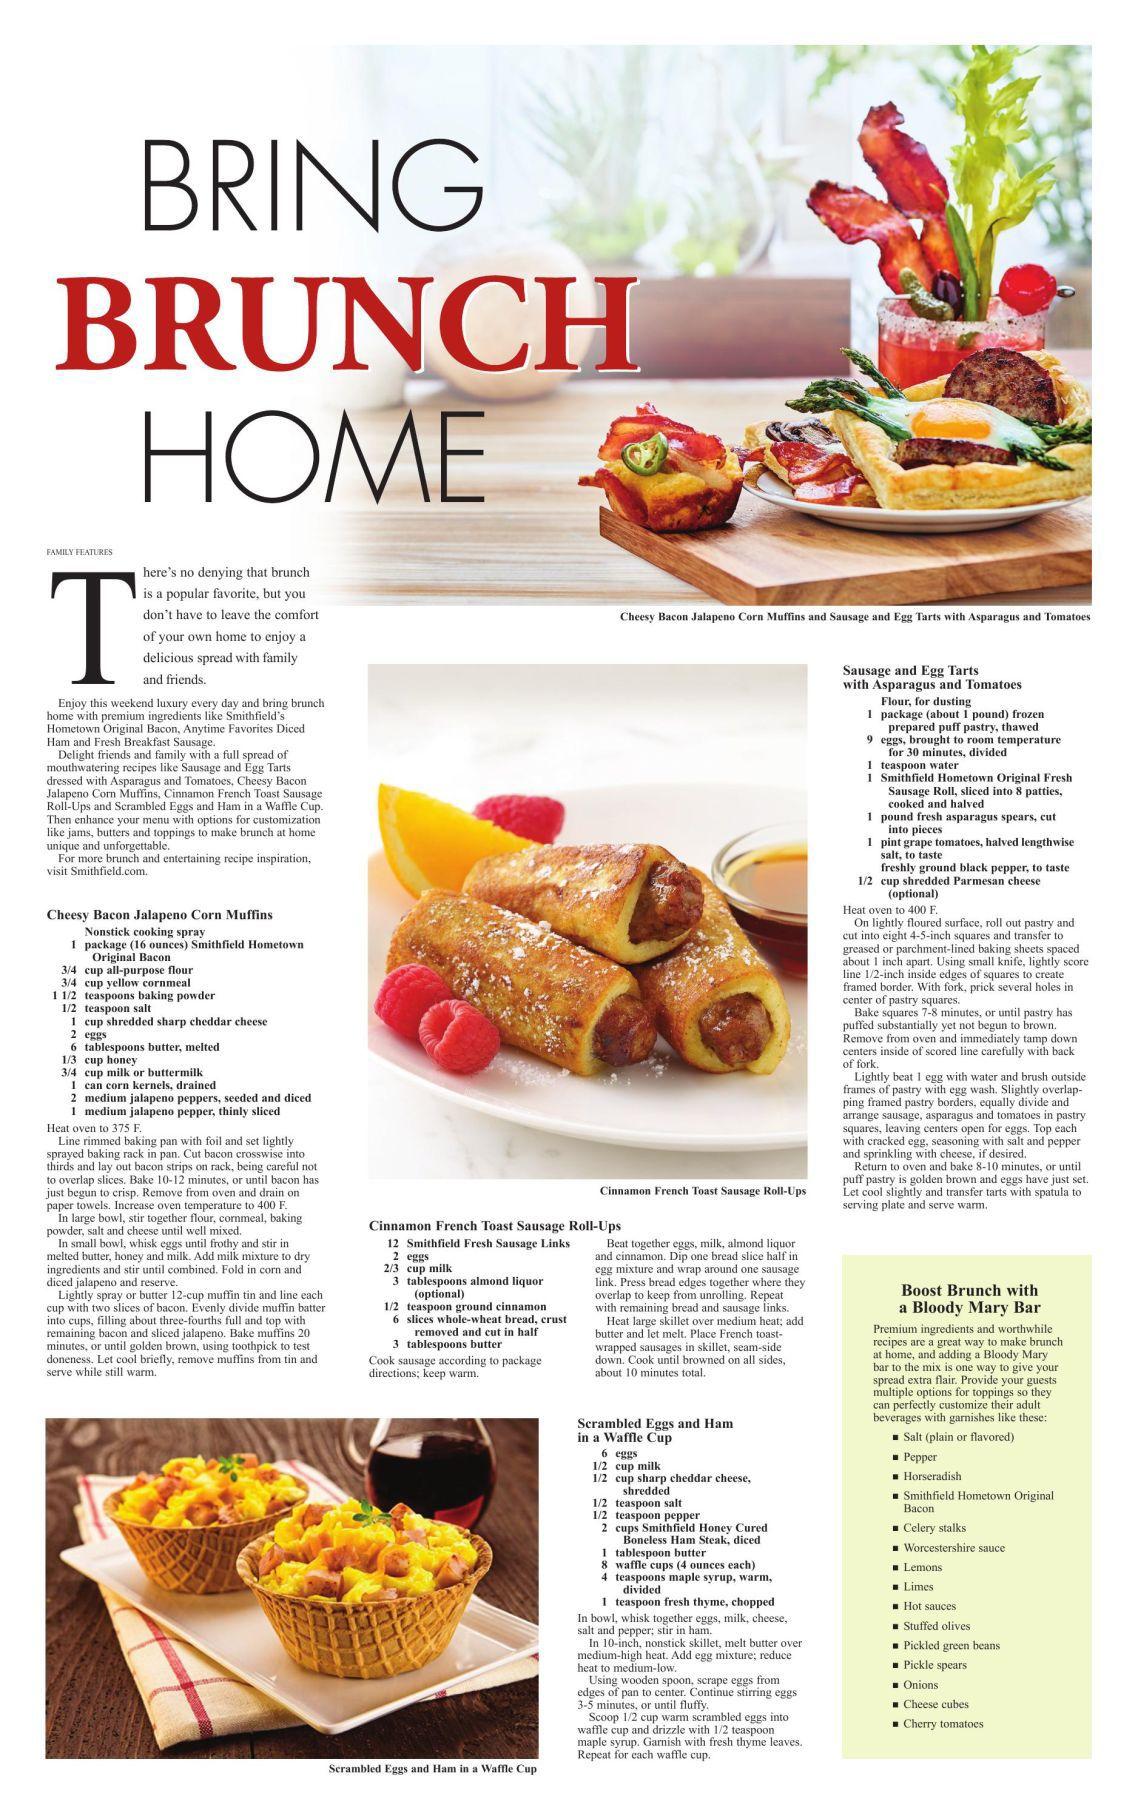 Bring Brunch Home Rapidcityjournal Com